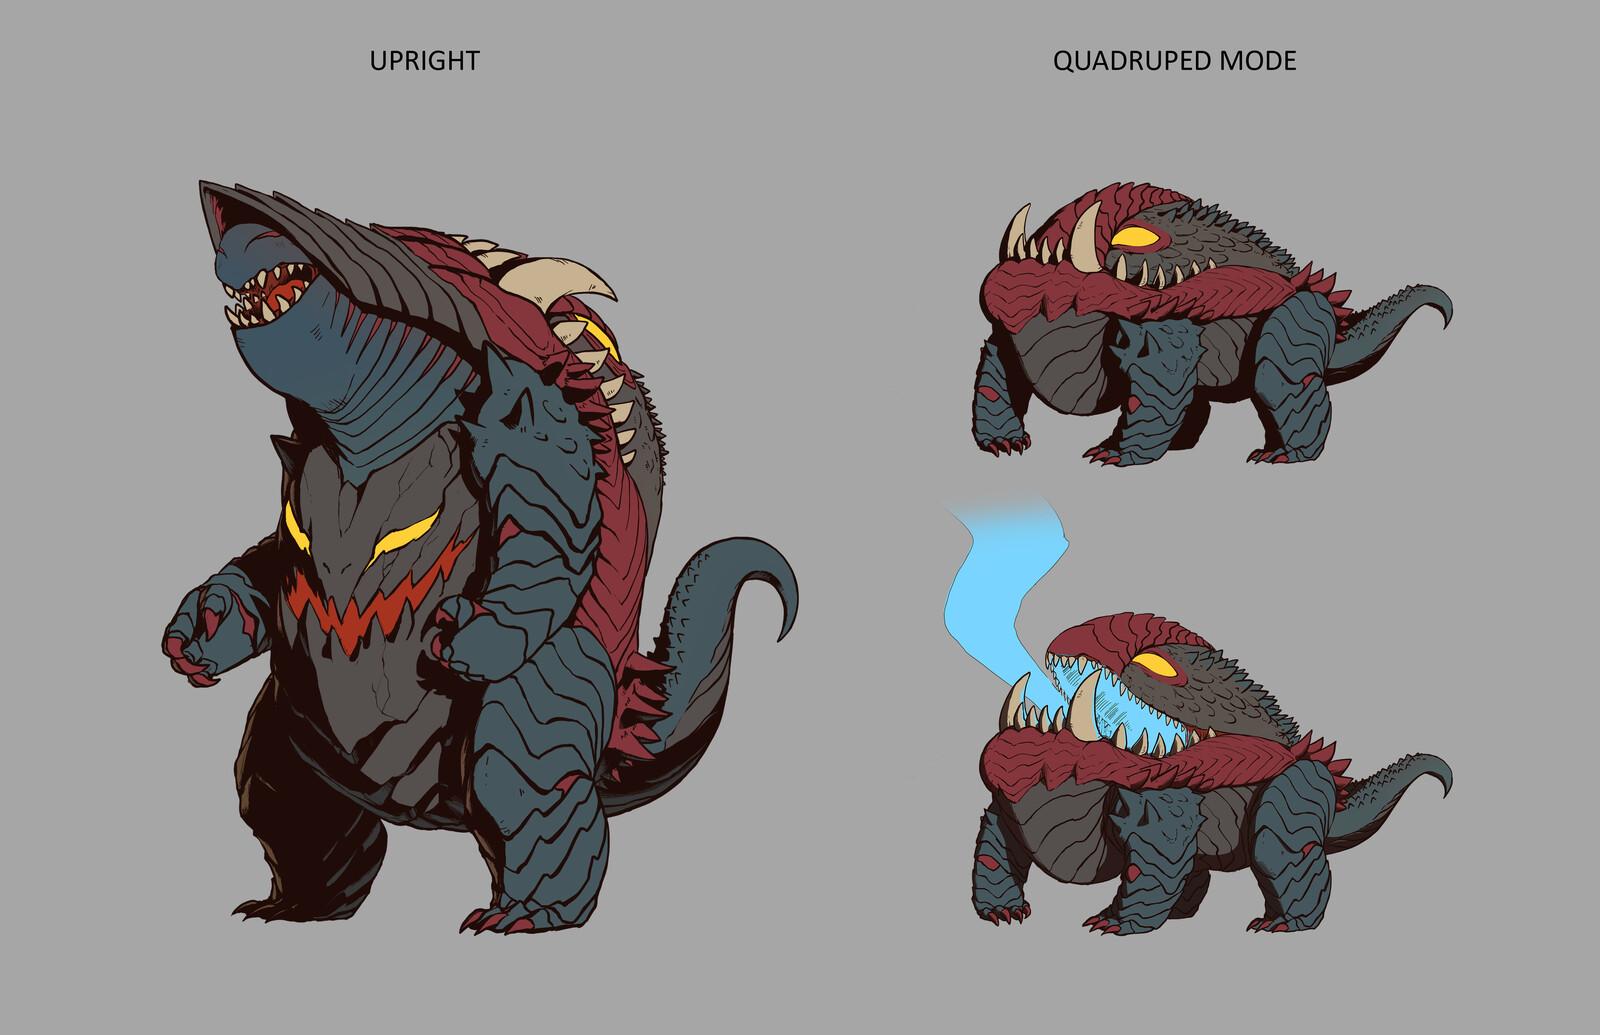 Kaiju: A Loose Interpretation of Azi Dahaka